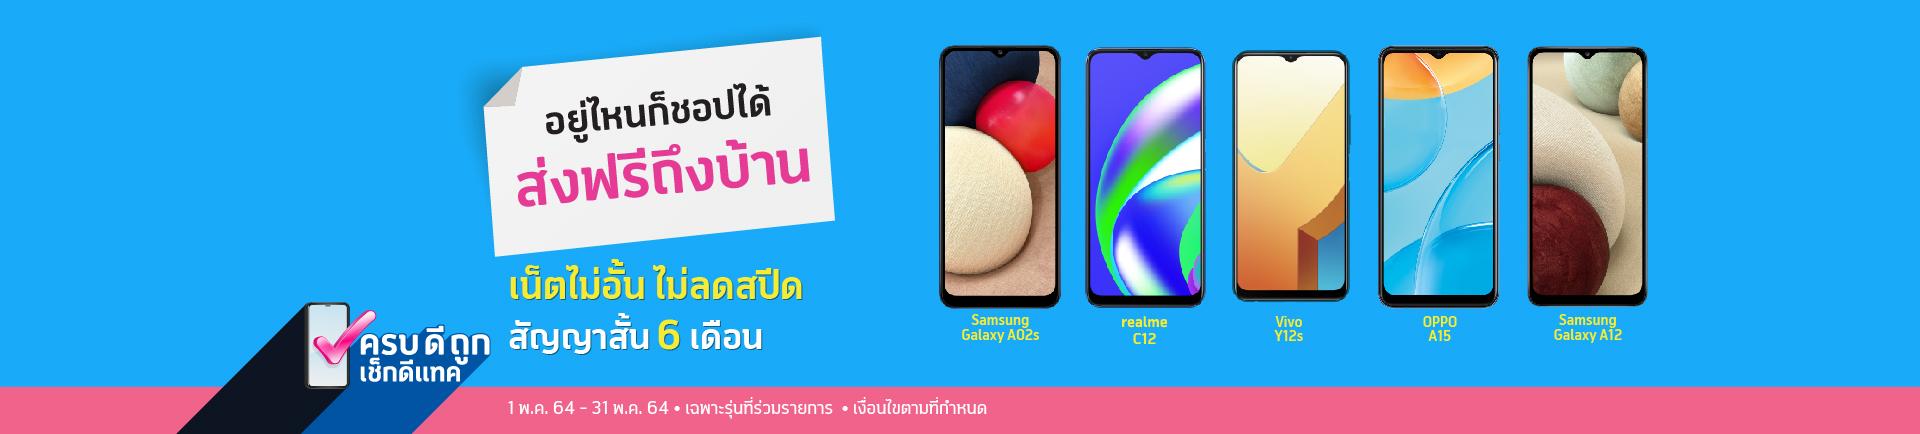 banner simkongkrapan